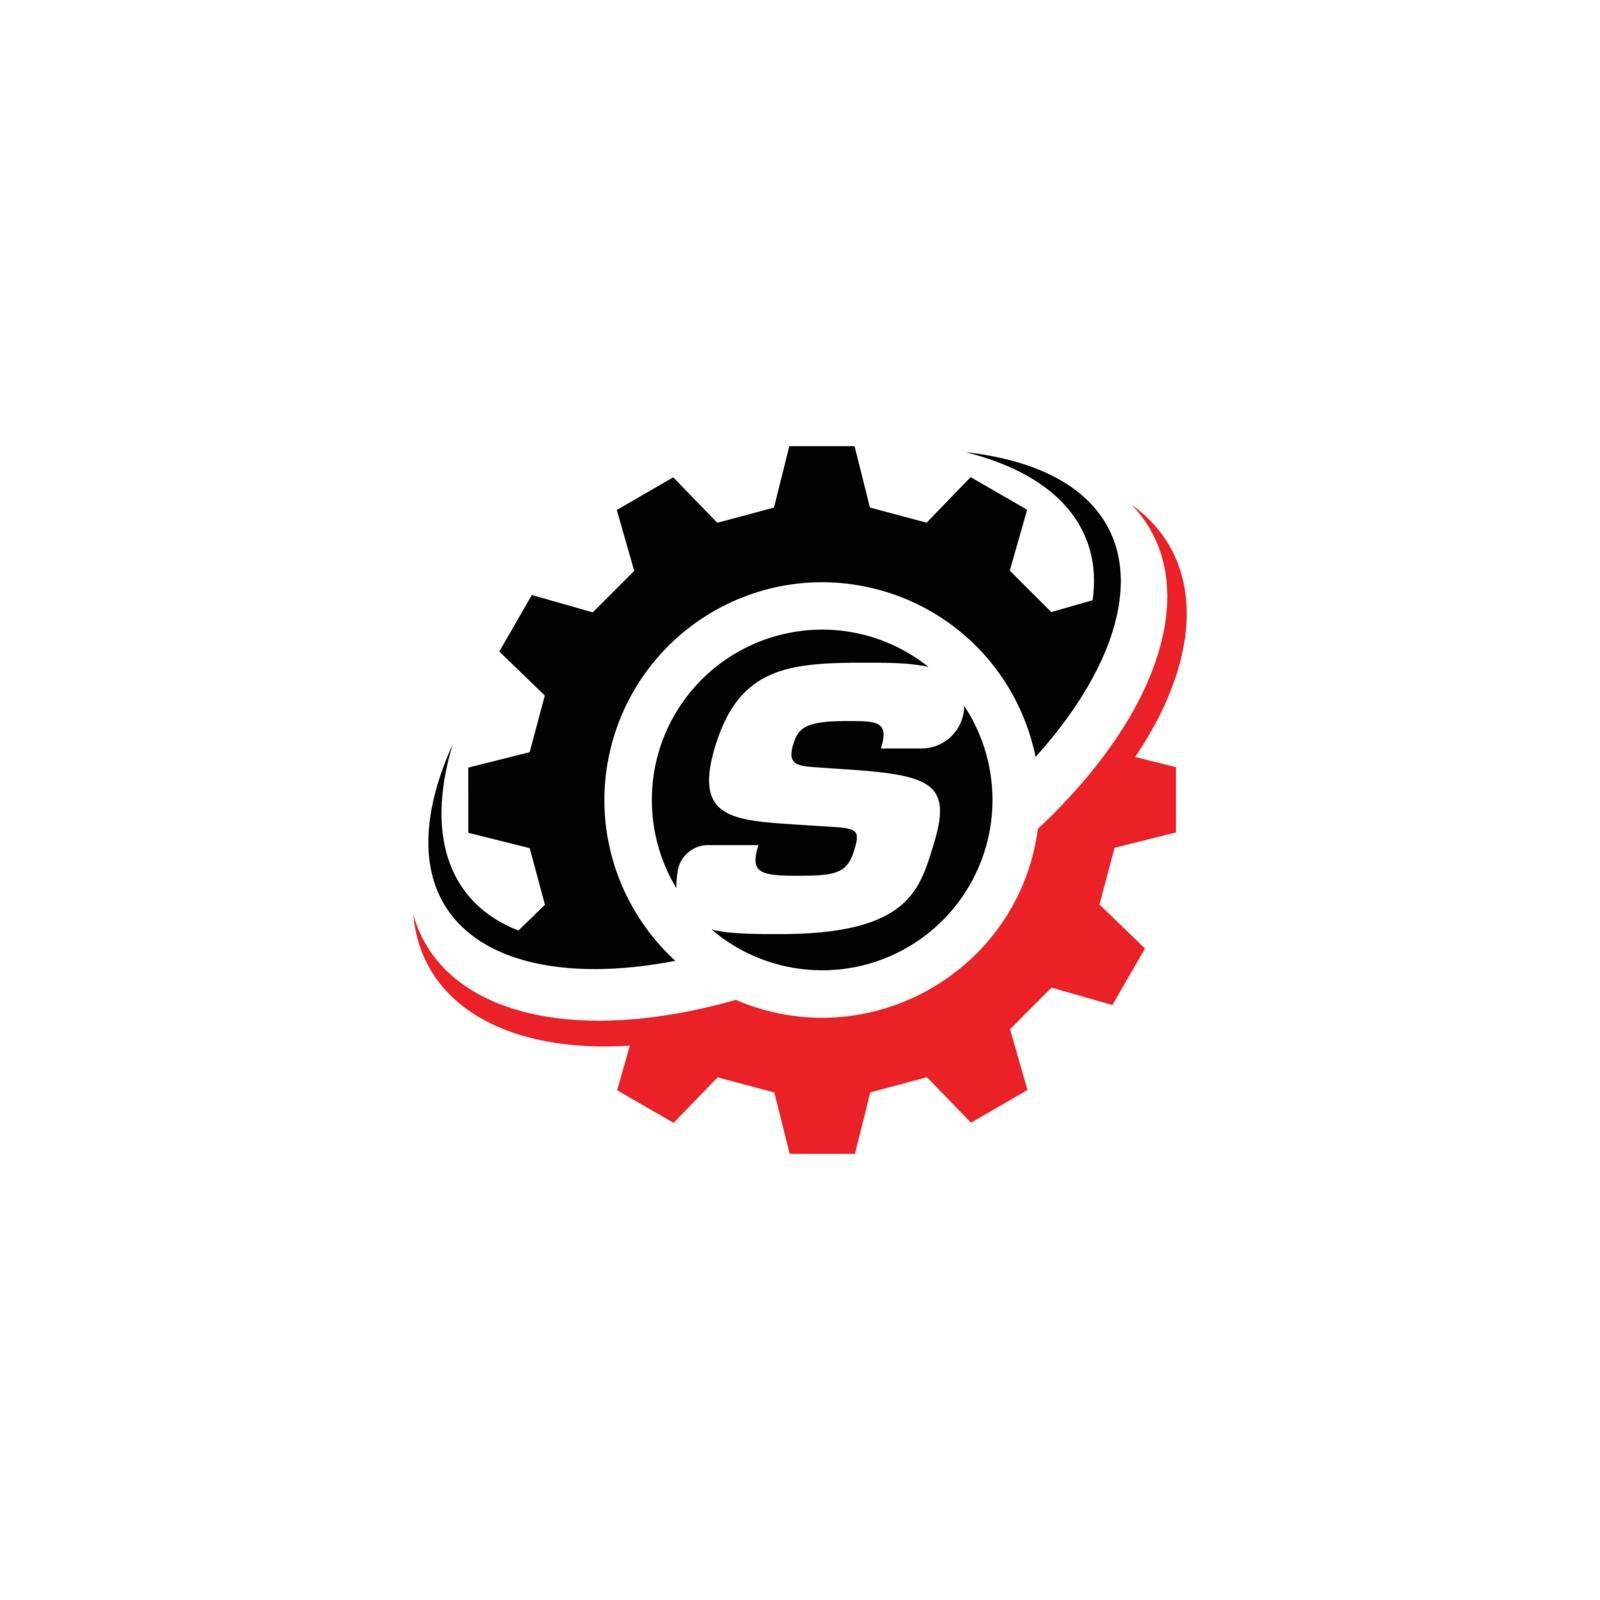 Letter S Gear Logo Design Template